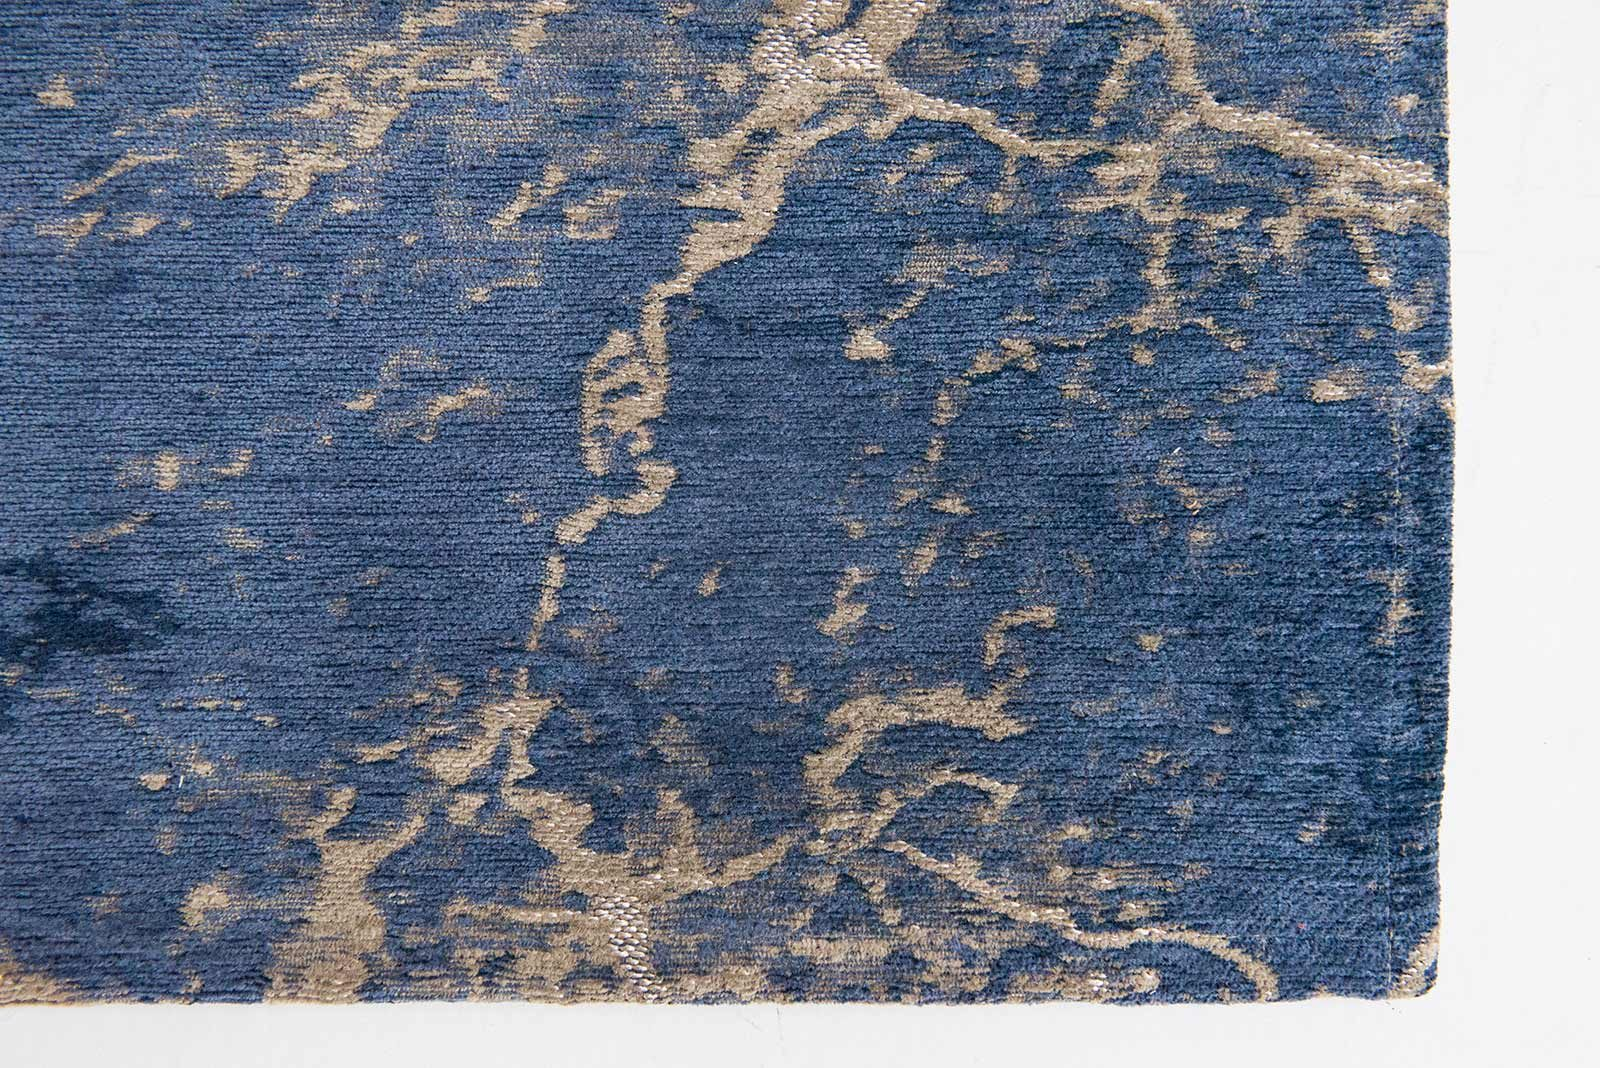 rugs Louis De Poortere LX8629 Mad Men Cracks Abyss Blue zoom 3